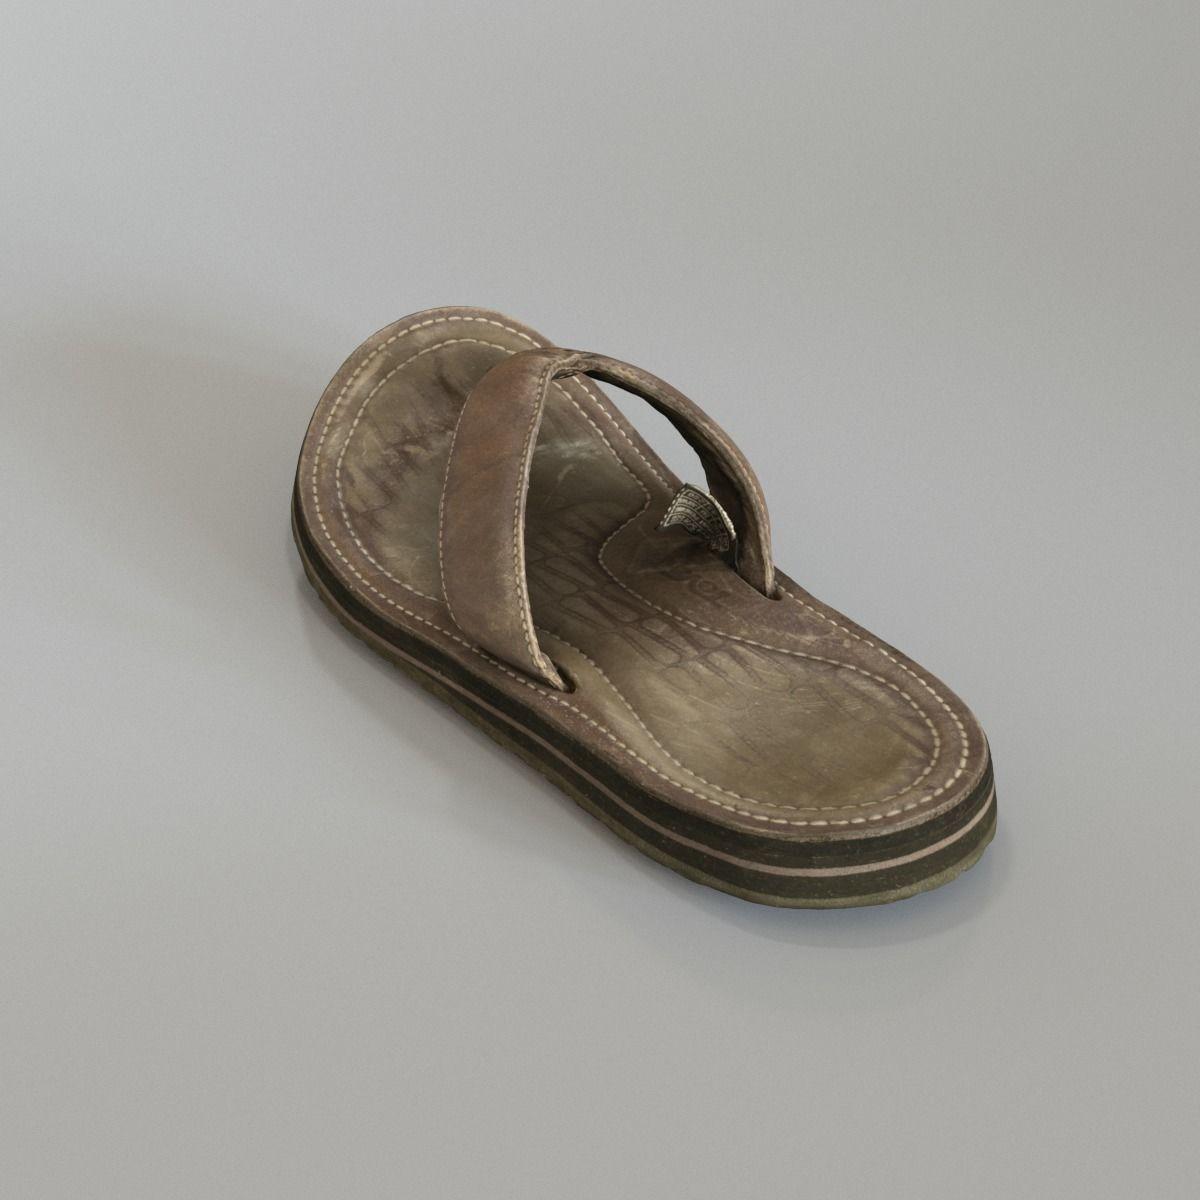 e41168bfe5ee67 ... old teva sandal 3d model max fbx c4d ma mb 3 ...